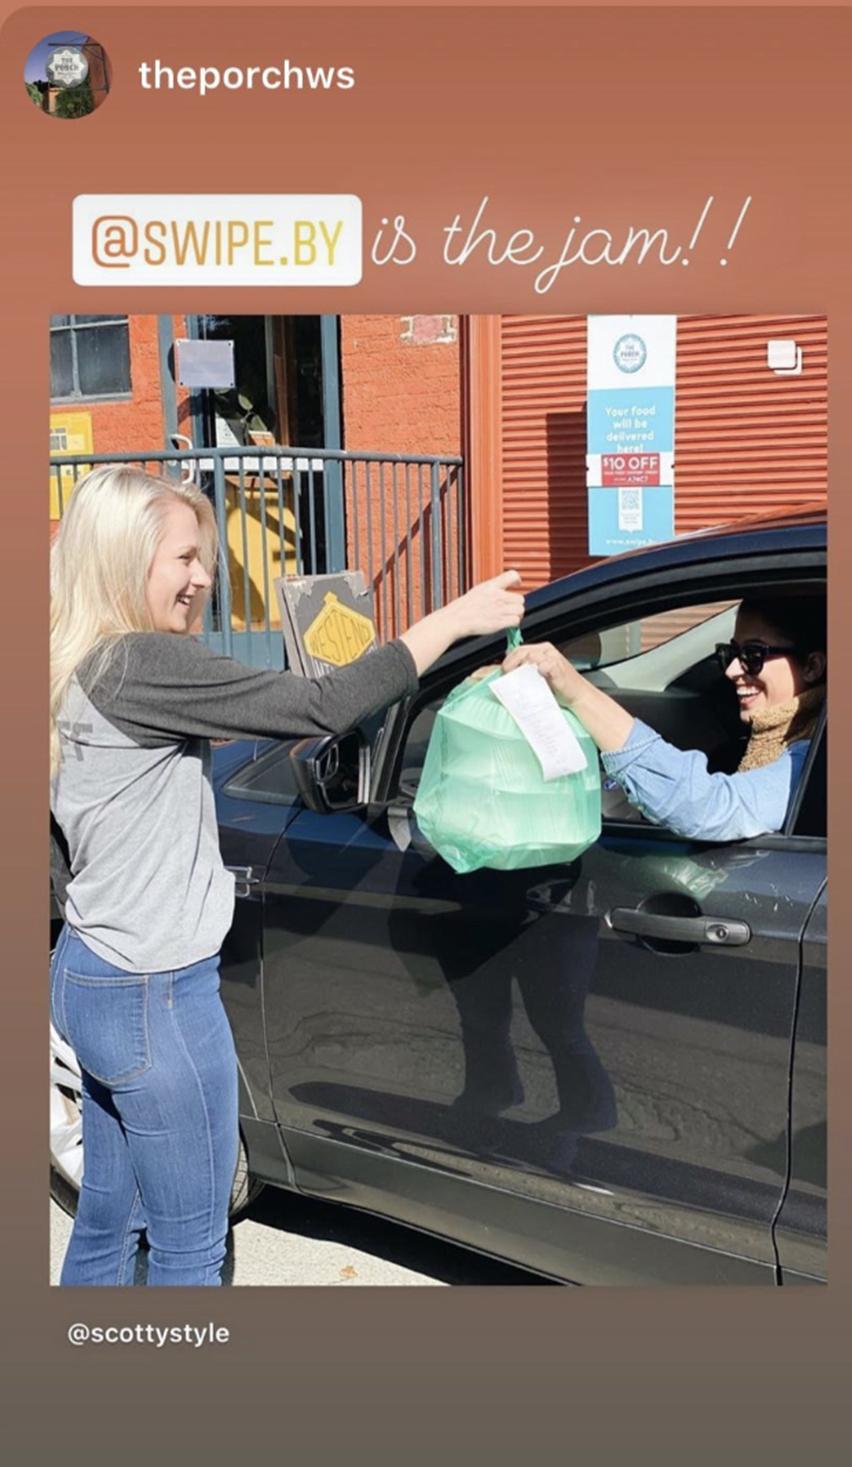 Staff handing off order to Swipeby customer in their car